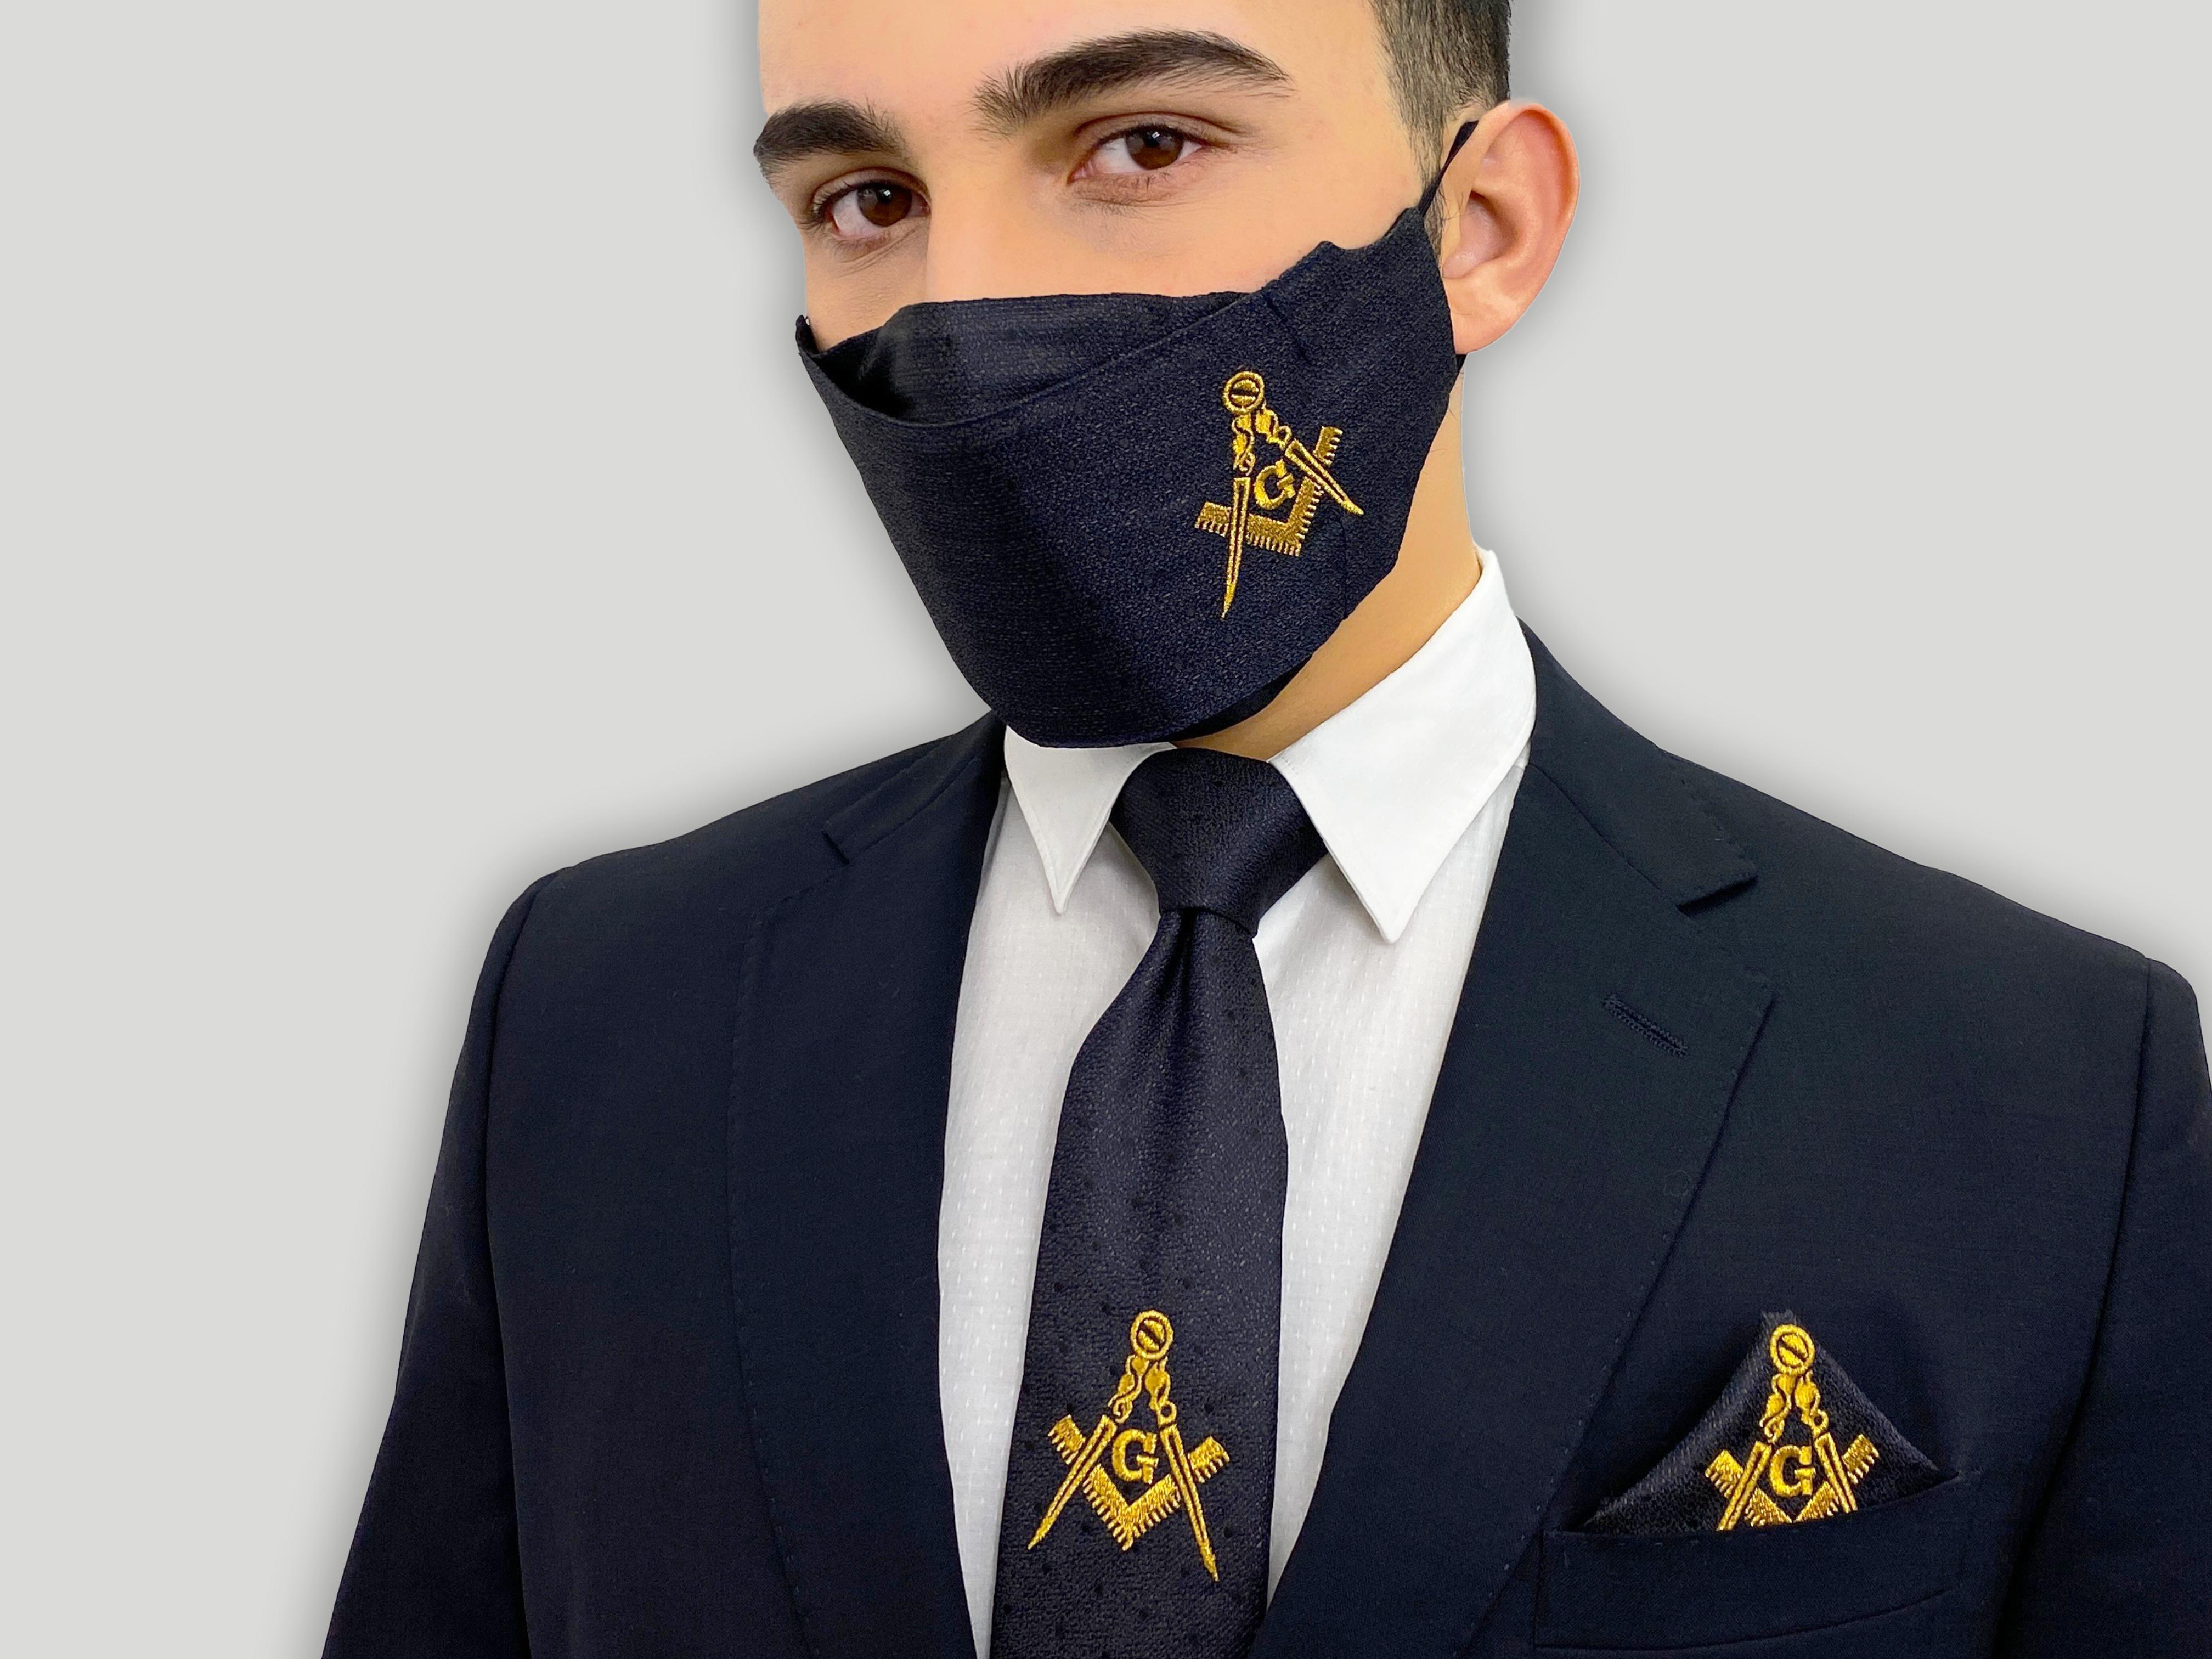 Masonic Embroidered Fave Mask Matching Tie and Handkerchief Set, Free Mason Gold Logo